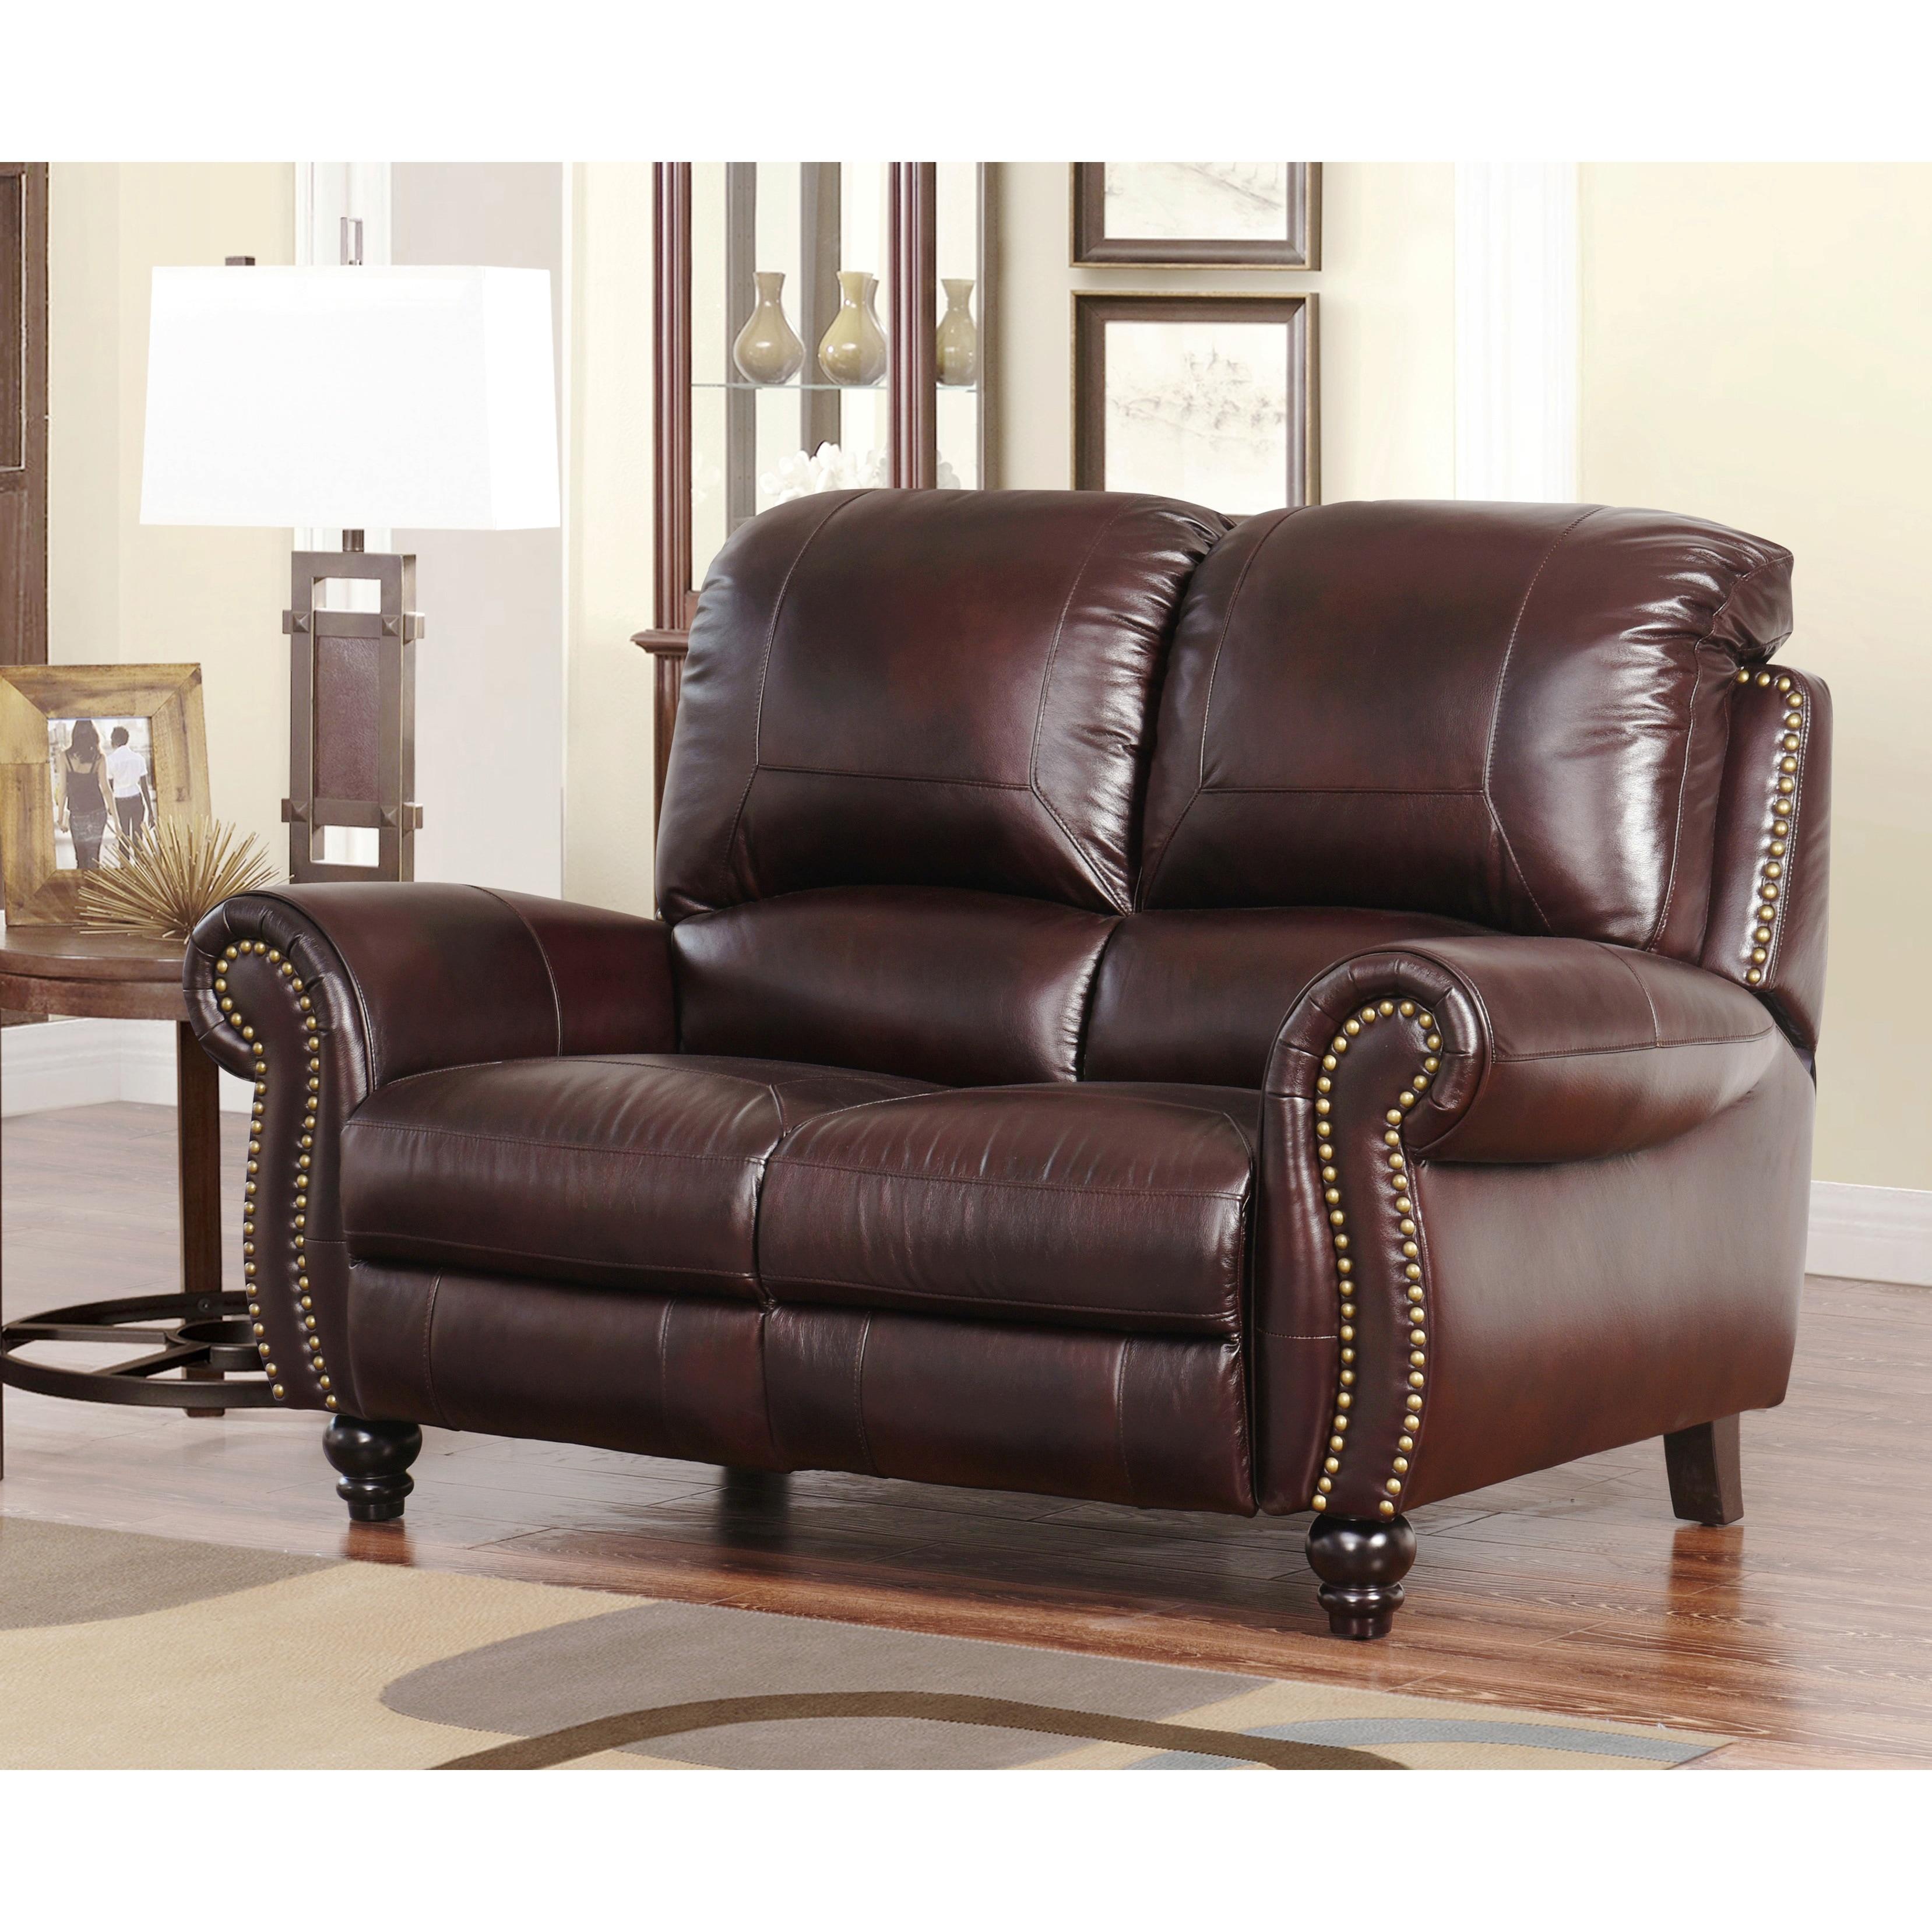 Italian leather reclining sofa Sofas